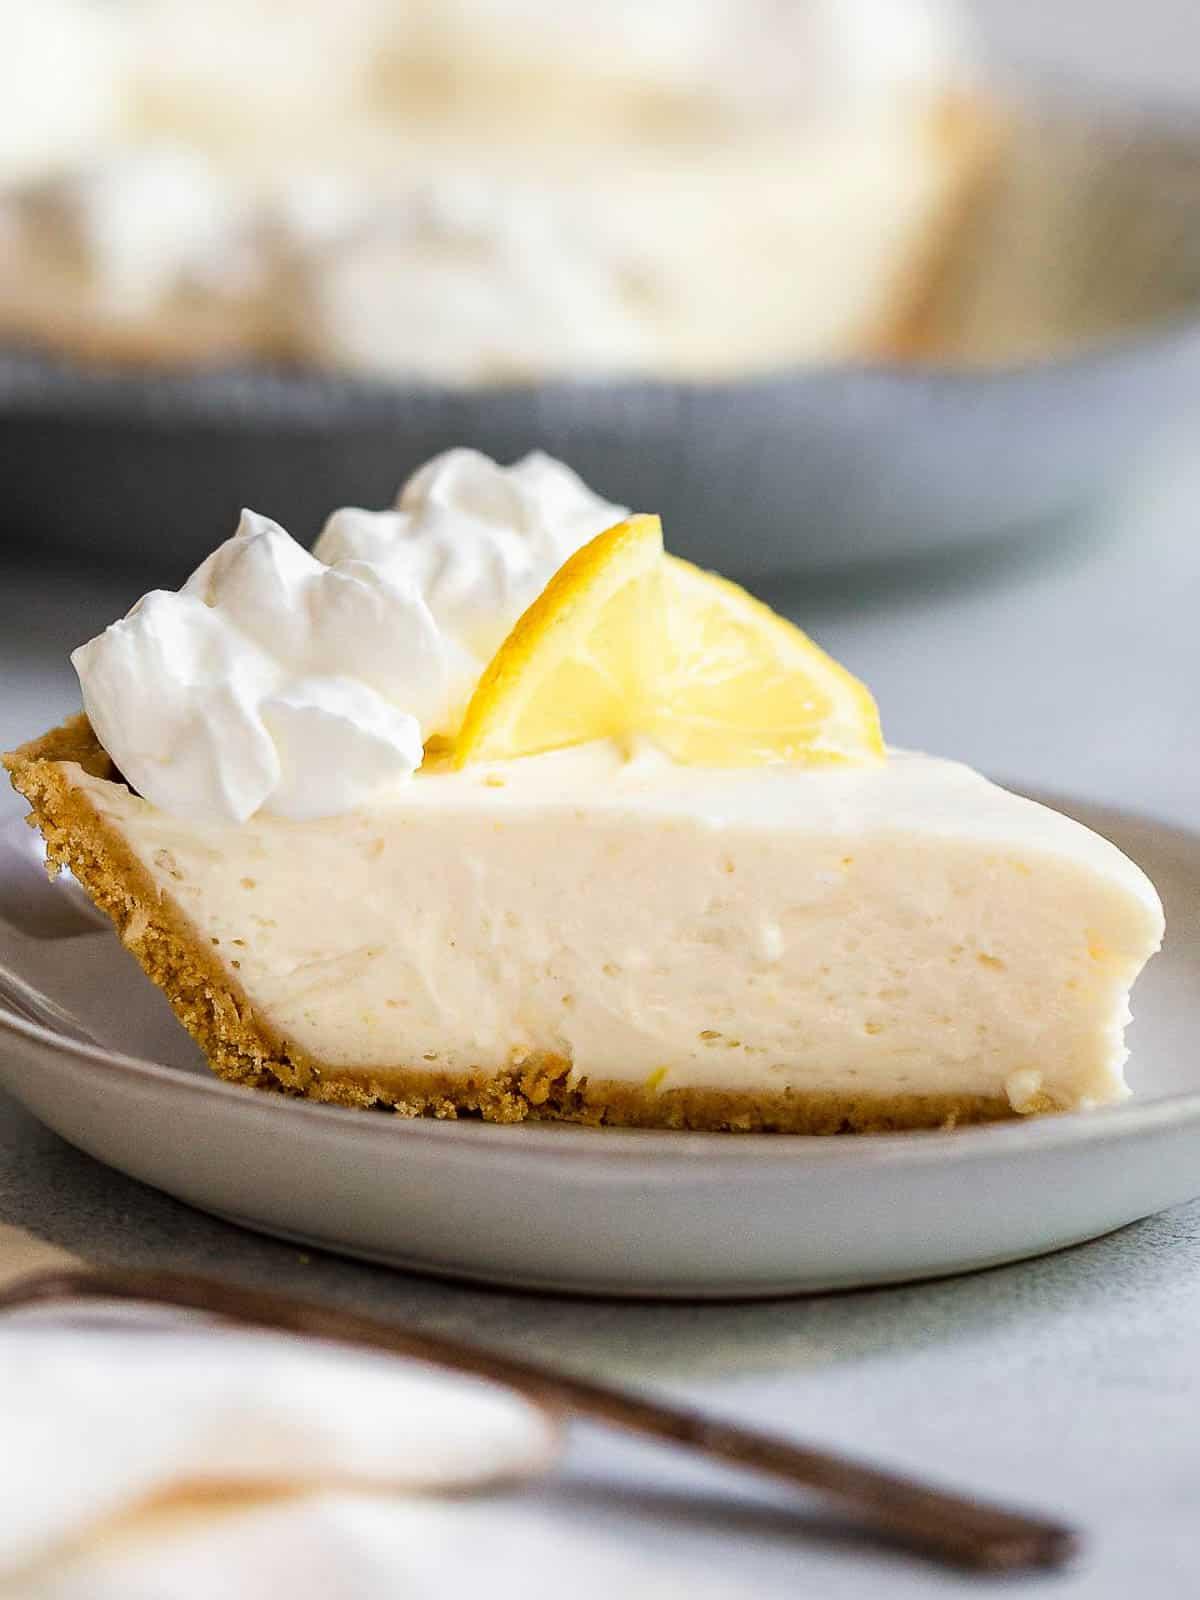 A slice of no-bake lemon icebox pie on a plate.